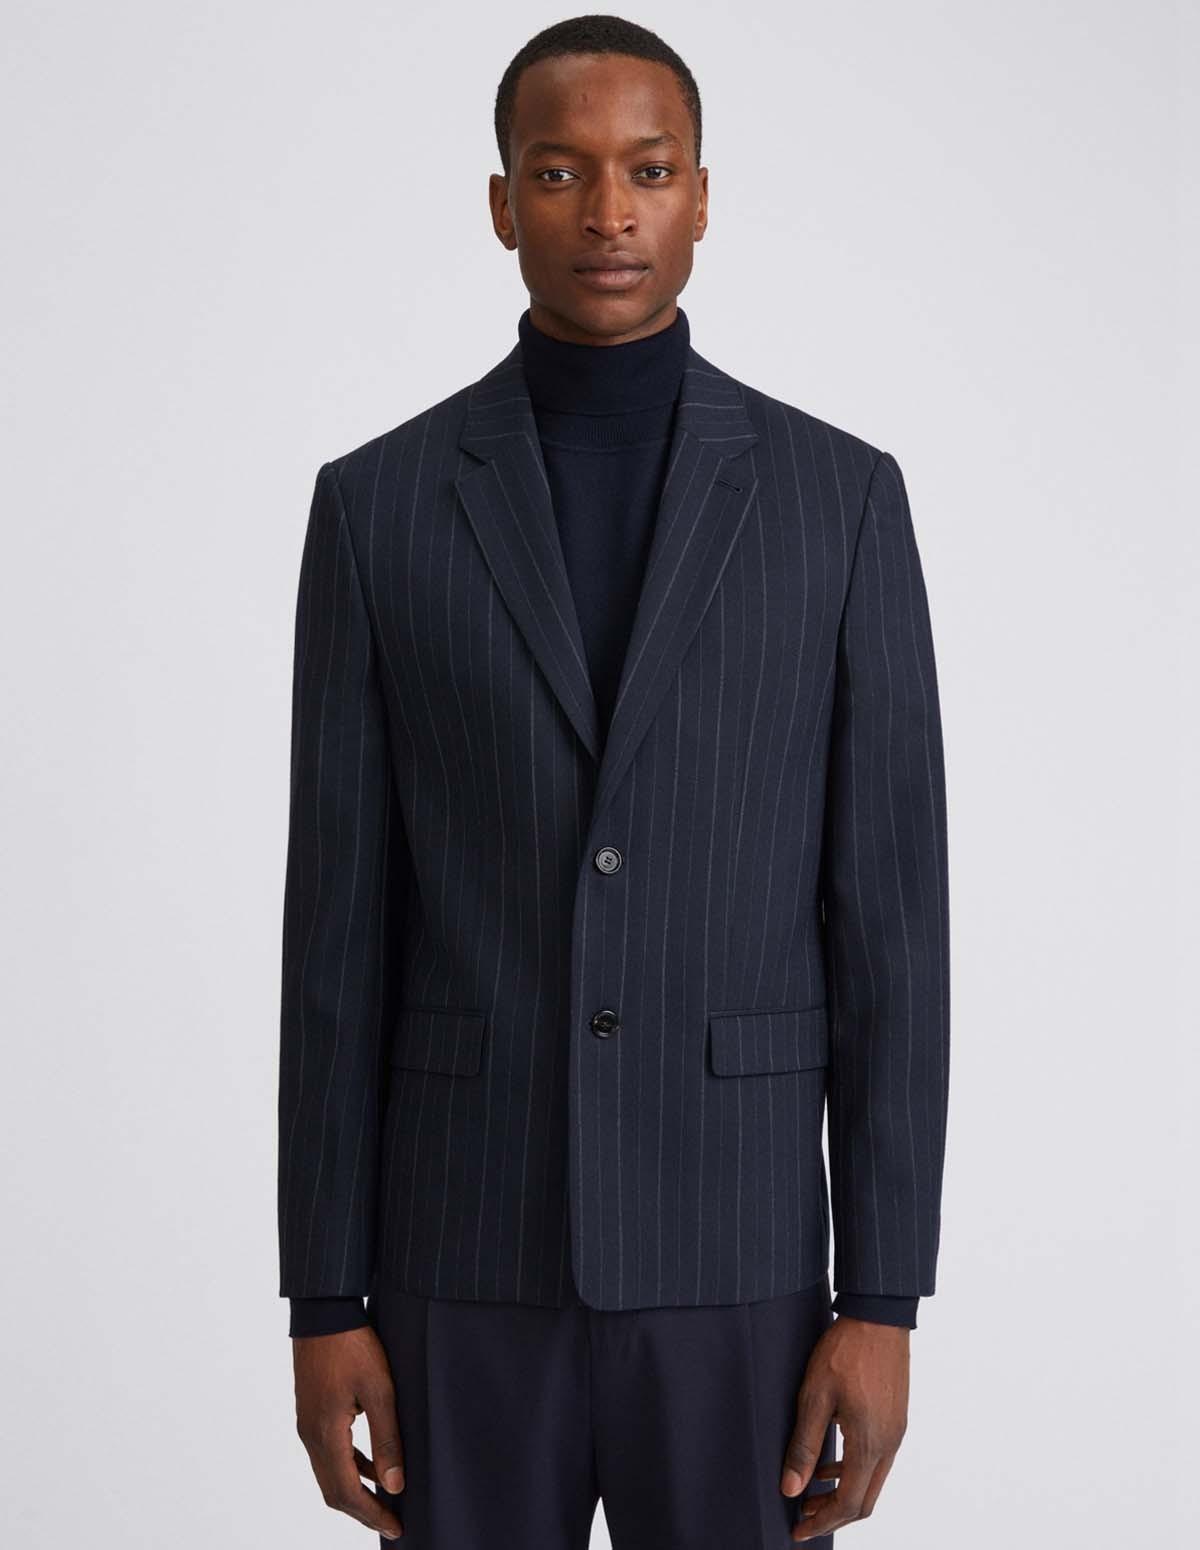 Fk M Harrison Striped Blazer - NAVY STRIP